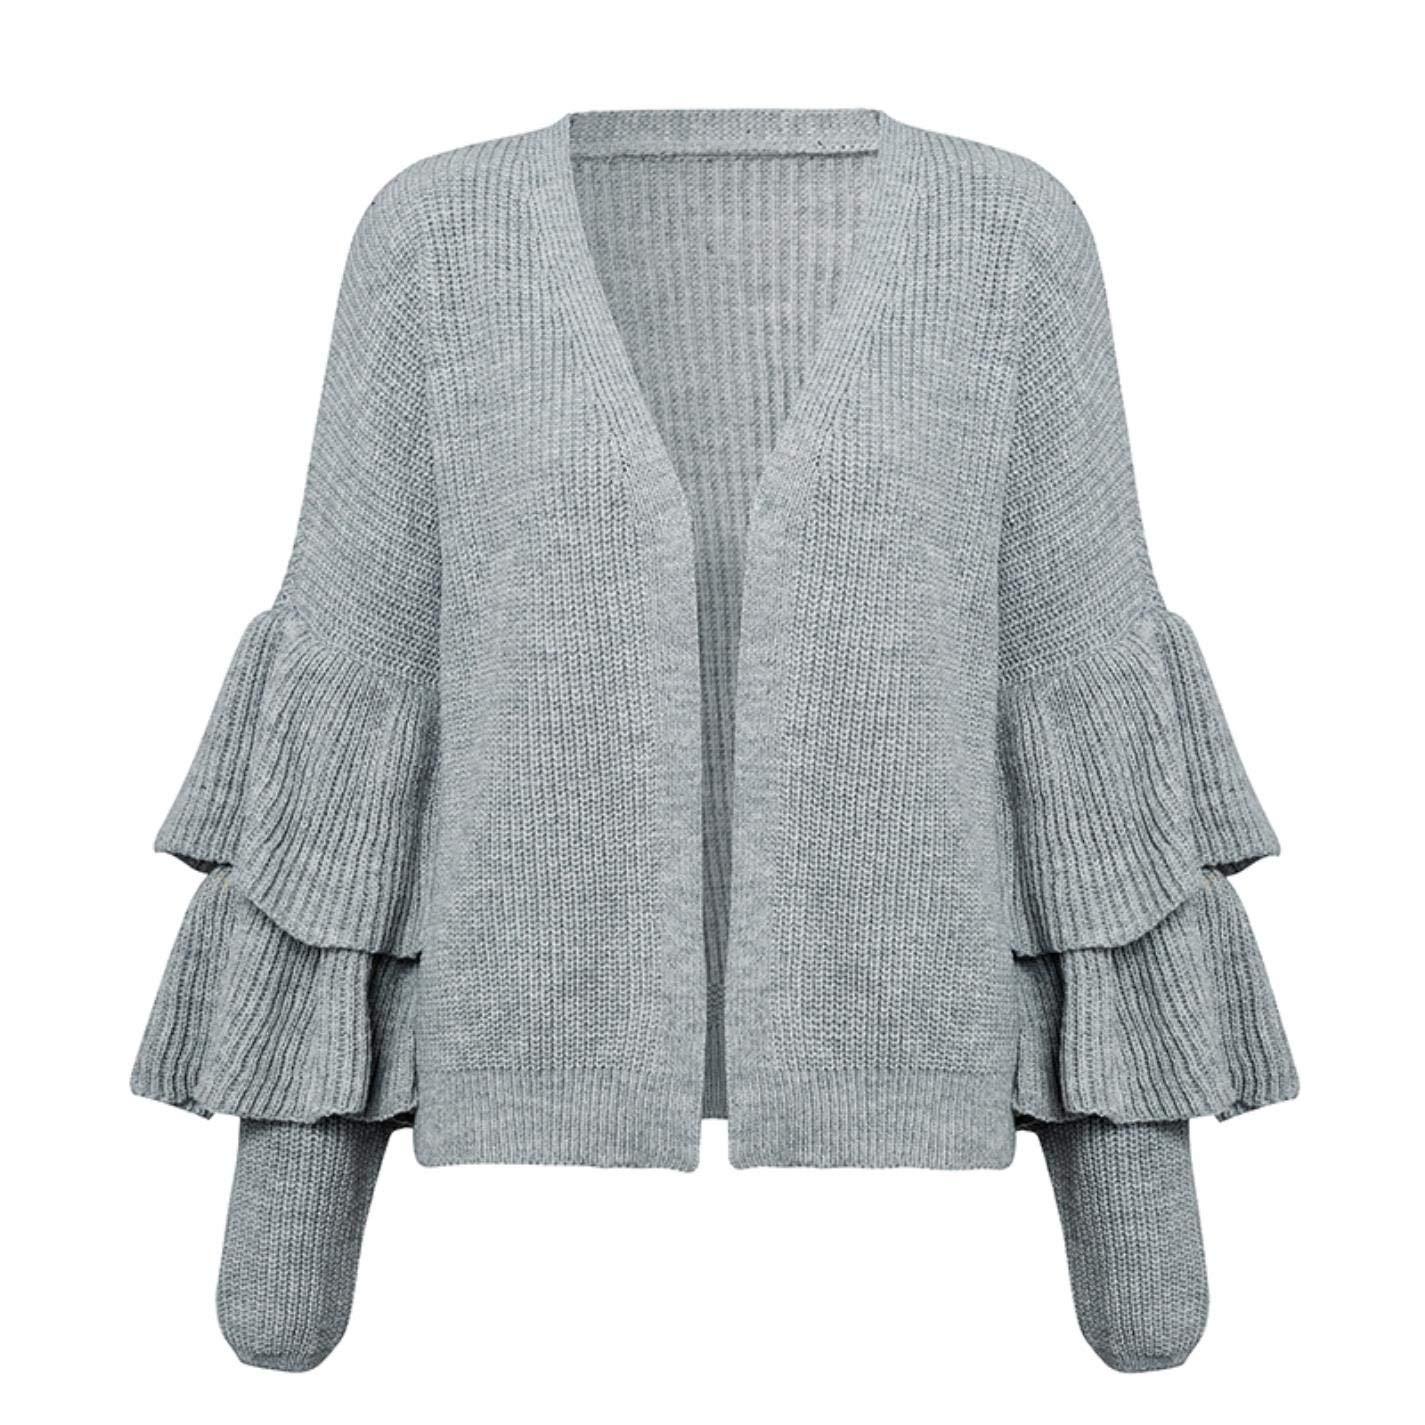 PjBWoEMP Womens Casual Street Ruffled Loose Long Sleeve Sweater